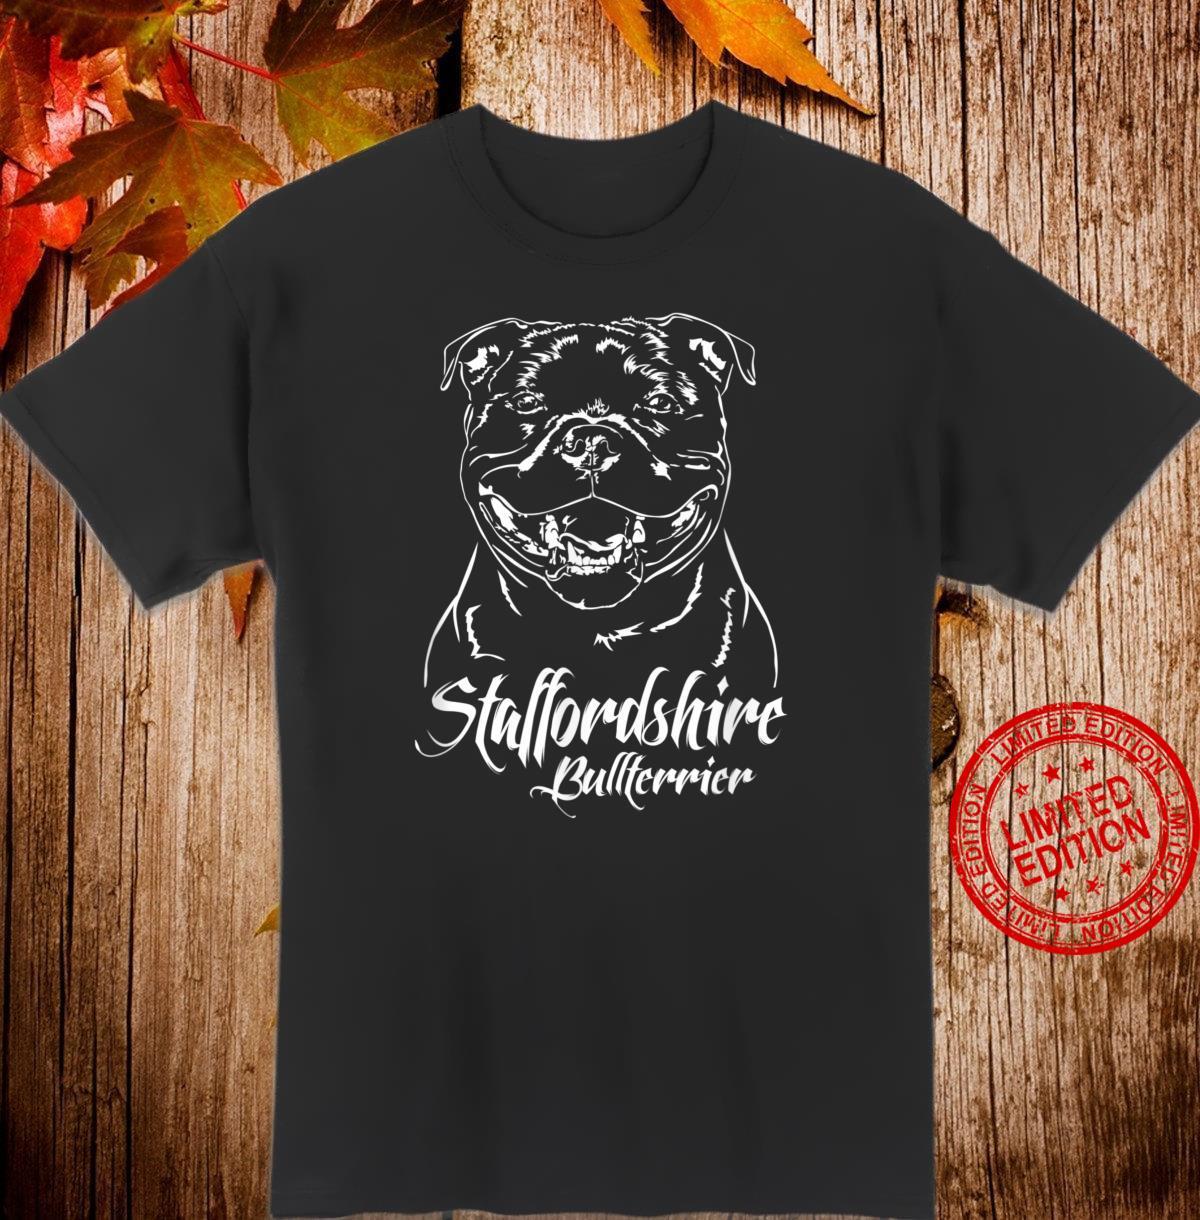 Staffordshire Bullterrier Hund Hunderasse Hunde Shirt